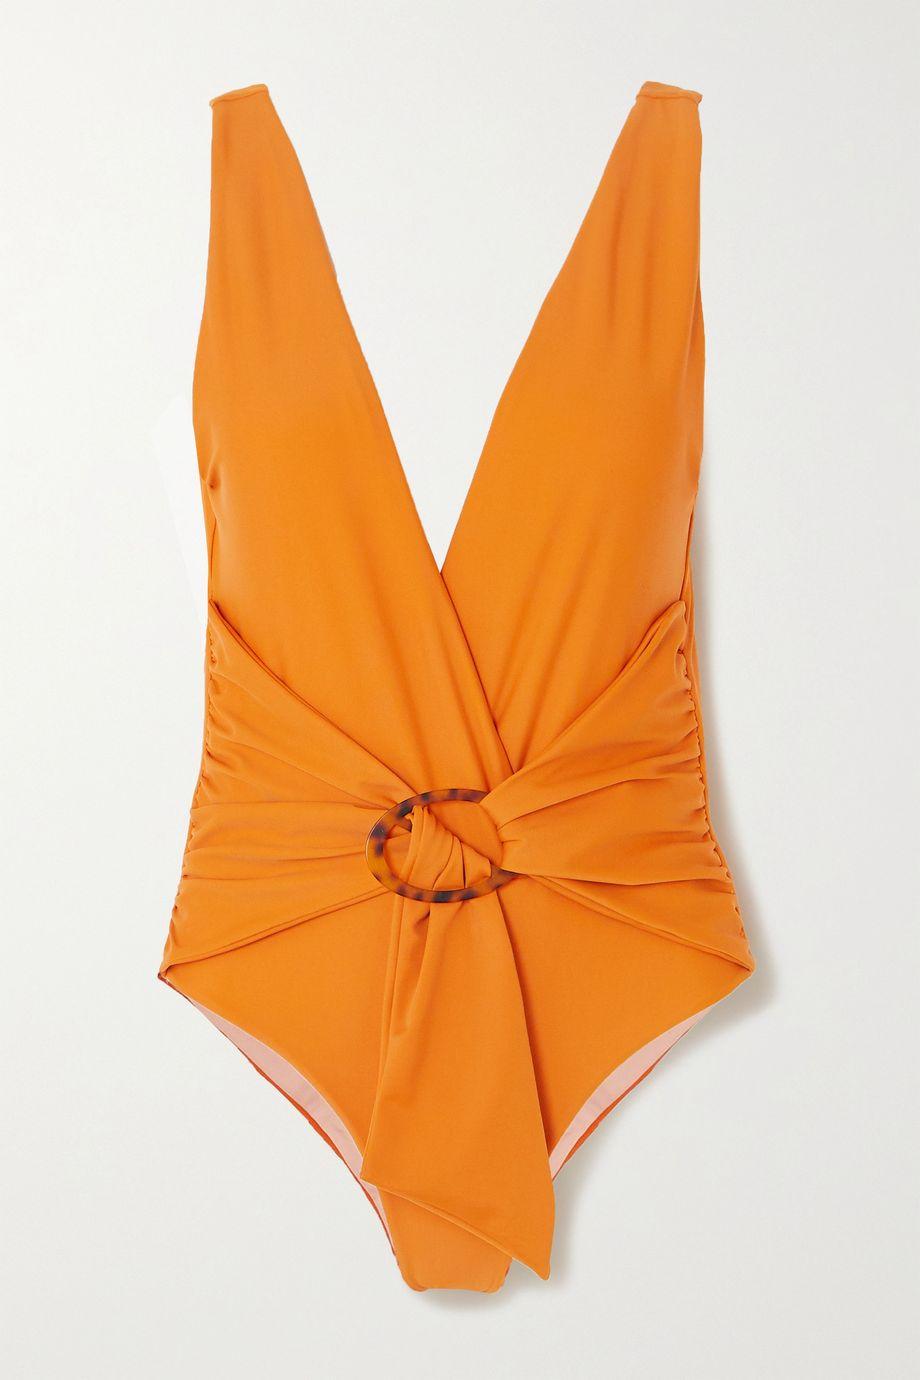 Johanna Ortiz Papaya Land belted swimsuit